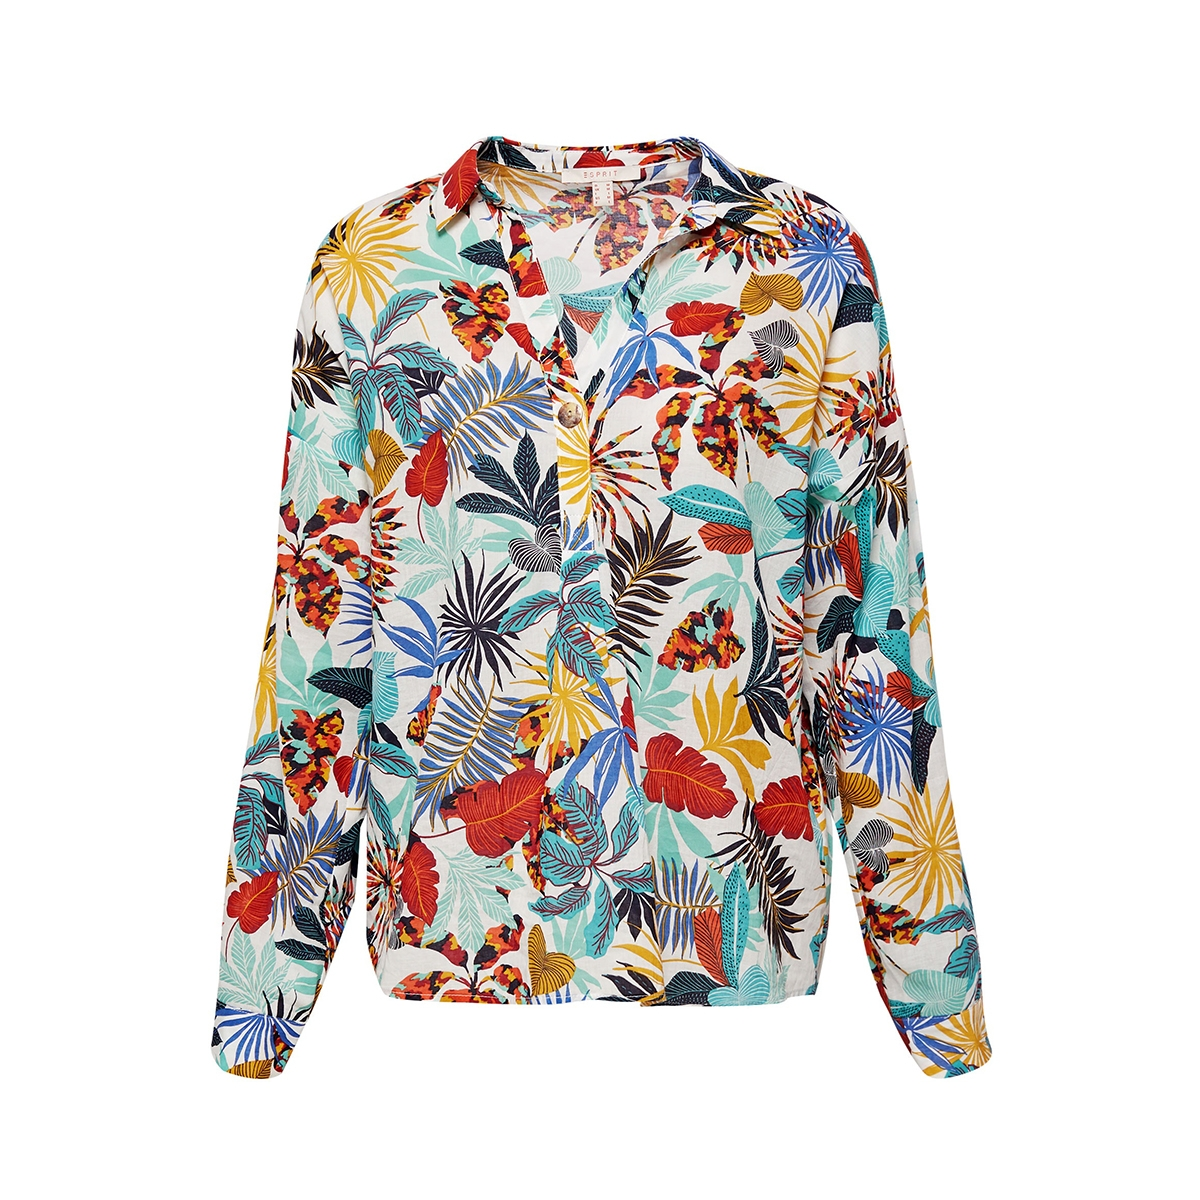 blouse met print en oprolbare mouwen 059ee1f003 esprit blouse e110